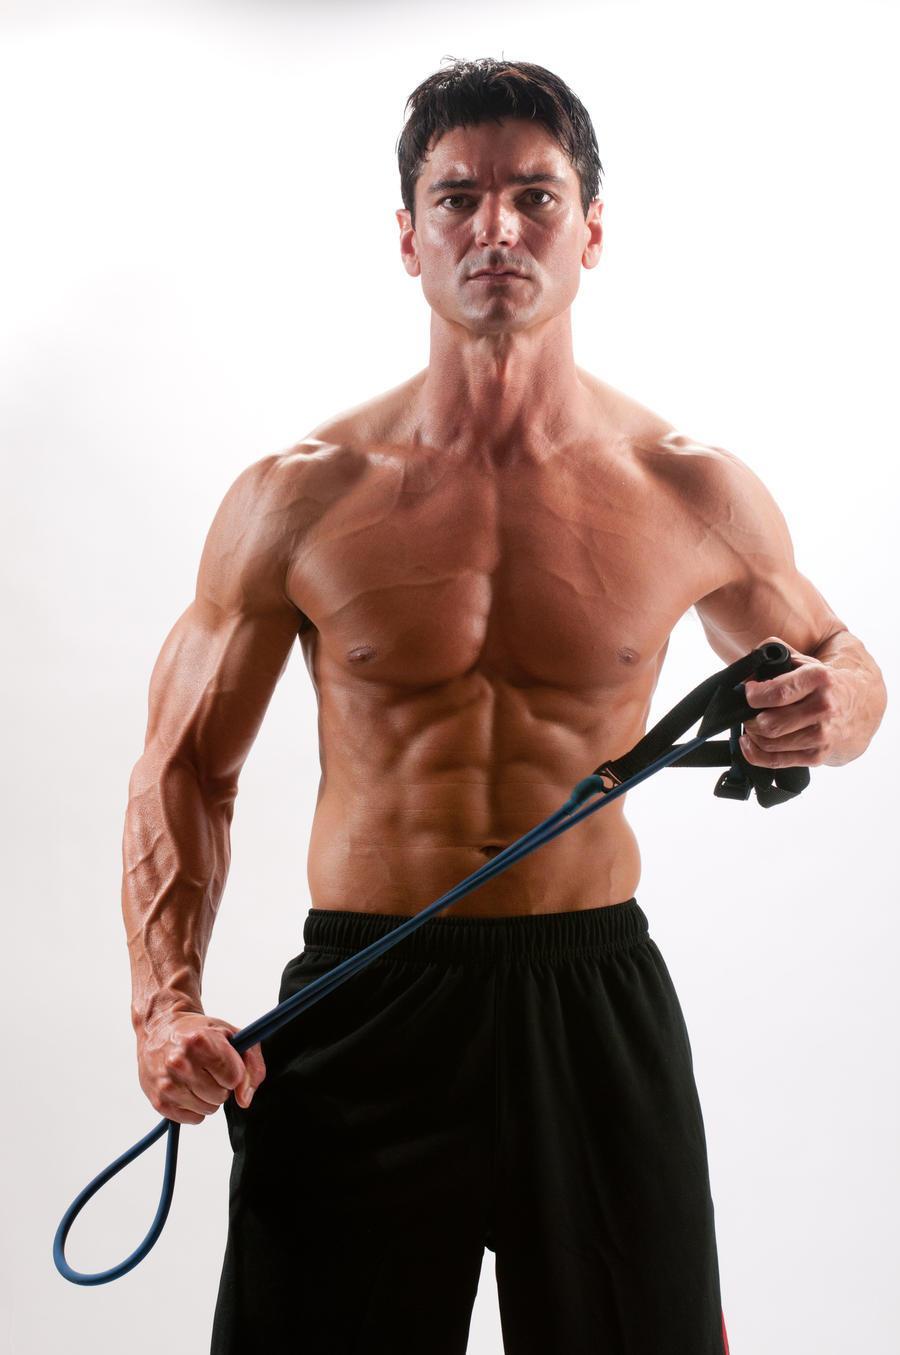 Jason Baca fitness cover 003 by jasonaaronbaca